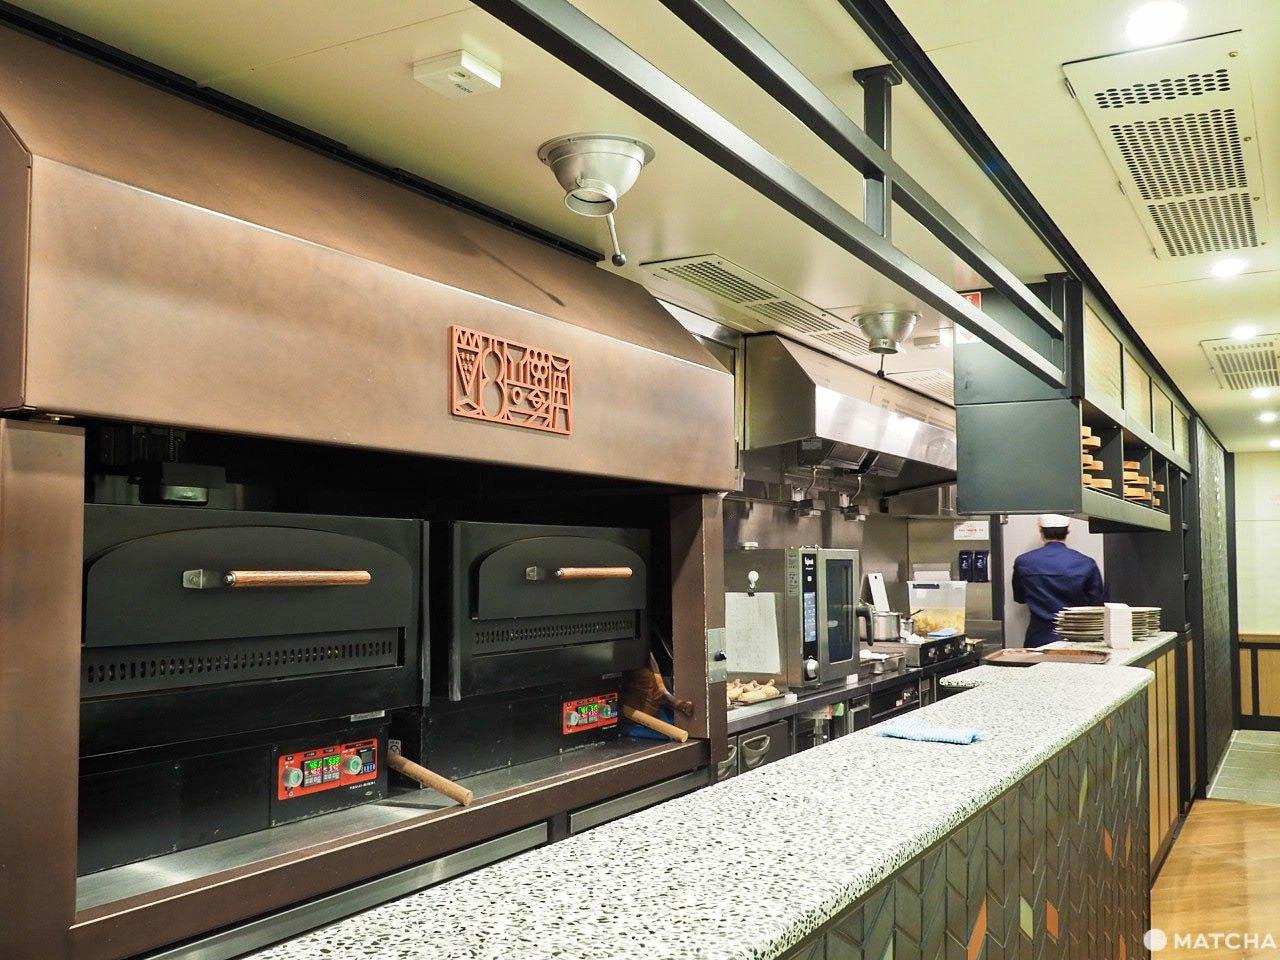 The Railway Kitchen Chikugo